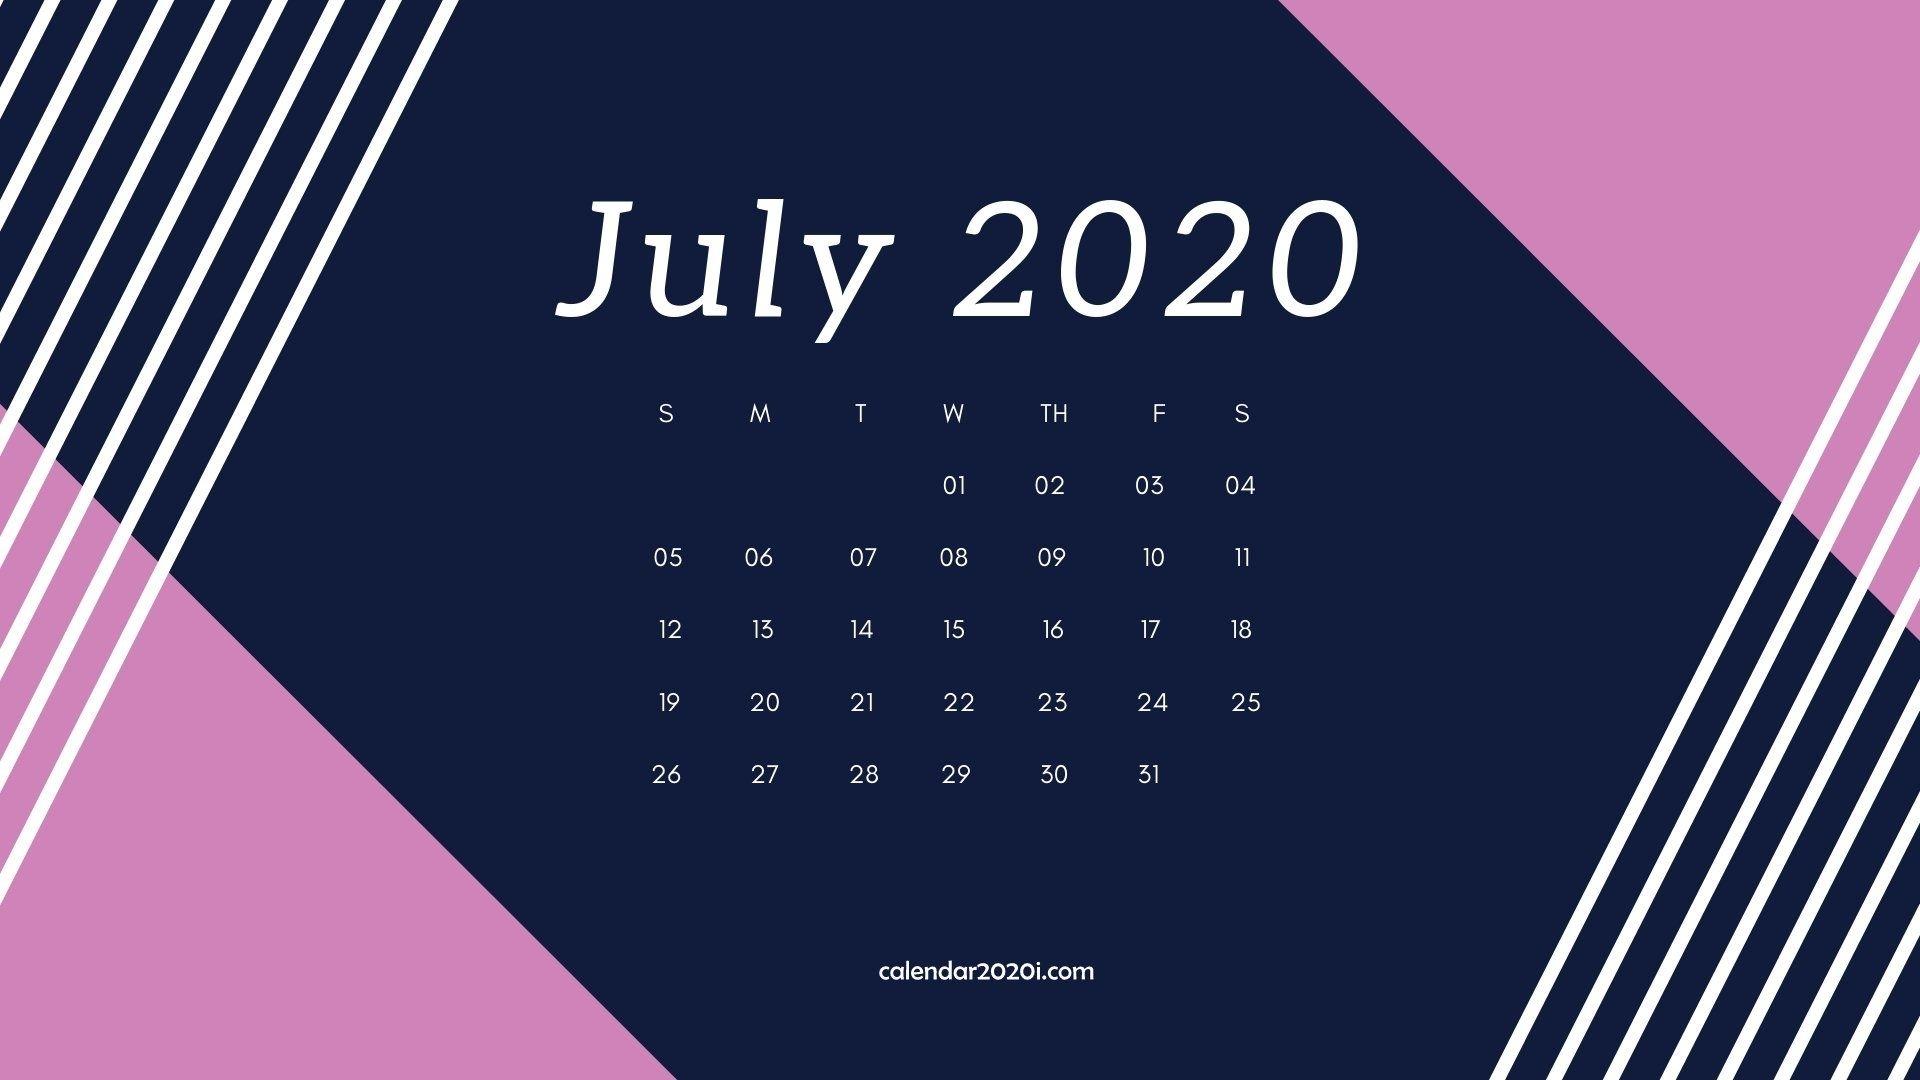 July 2020 Calendar Desktop Wallpaper In 2019   Calendar